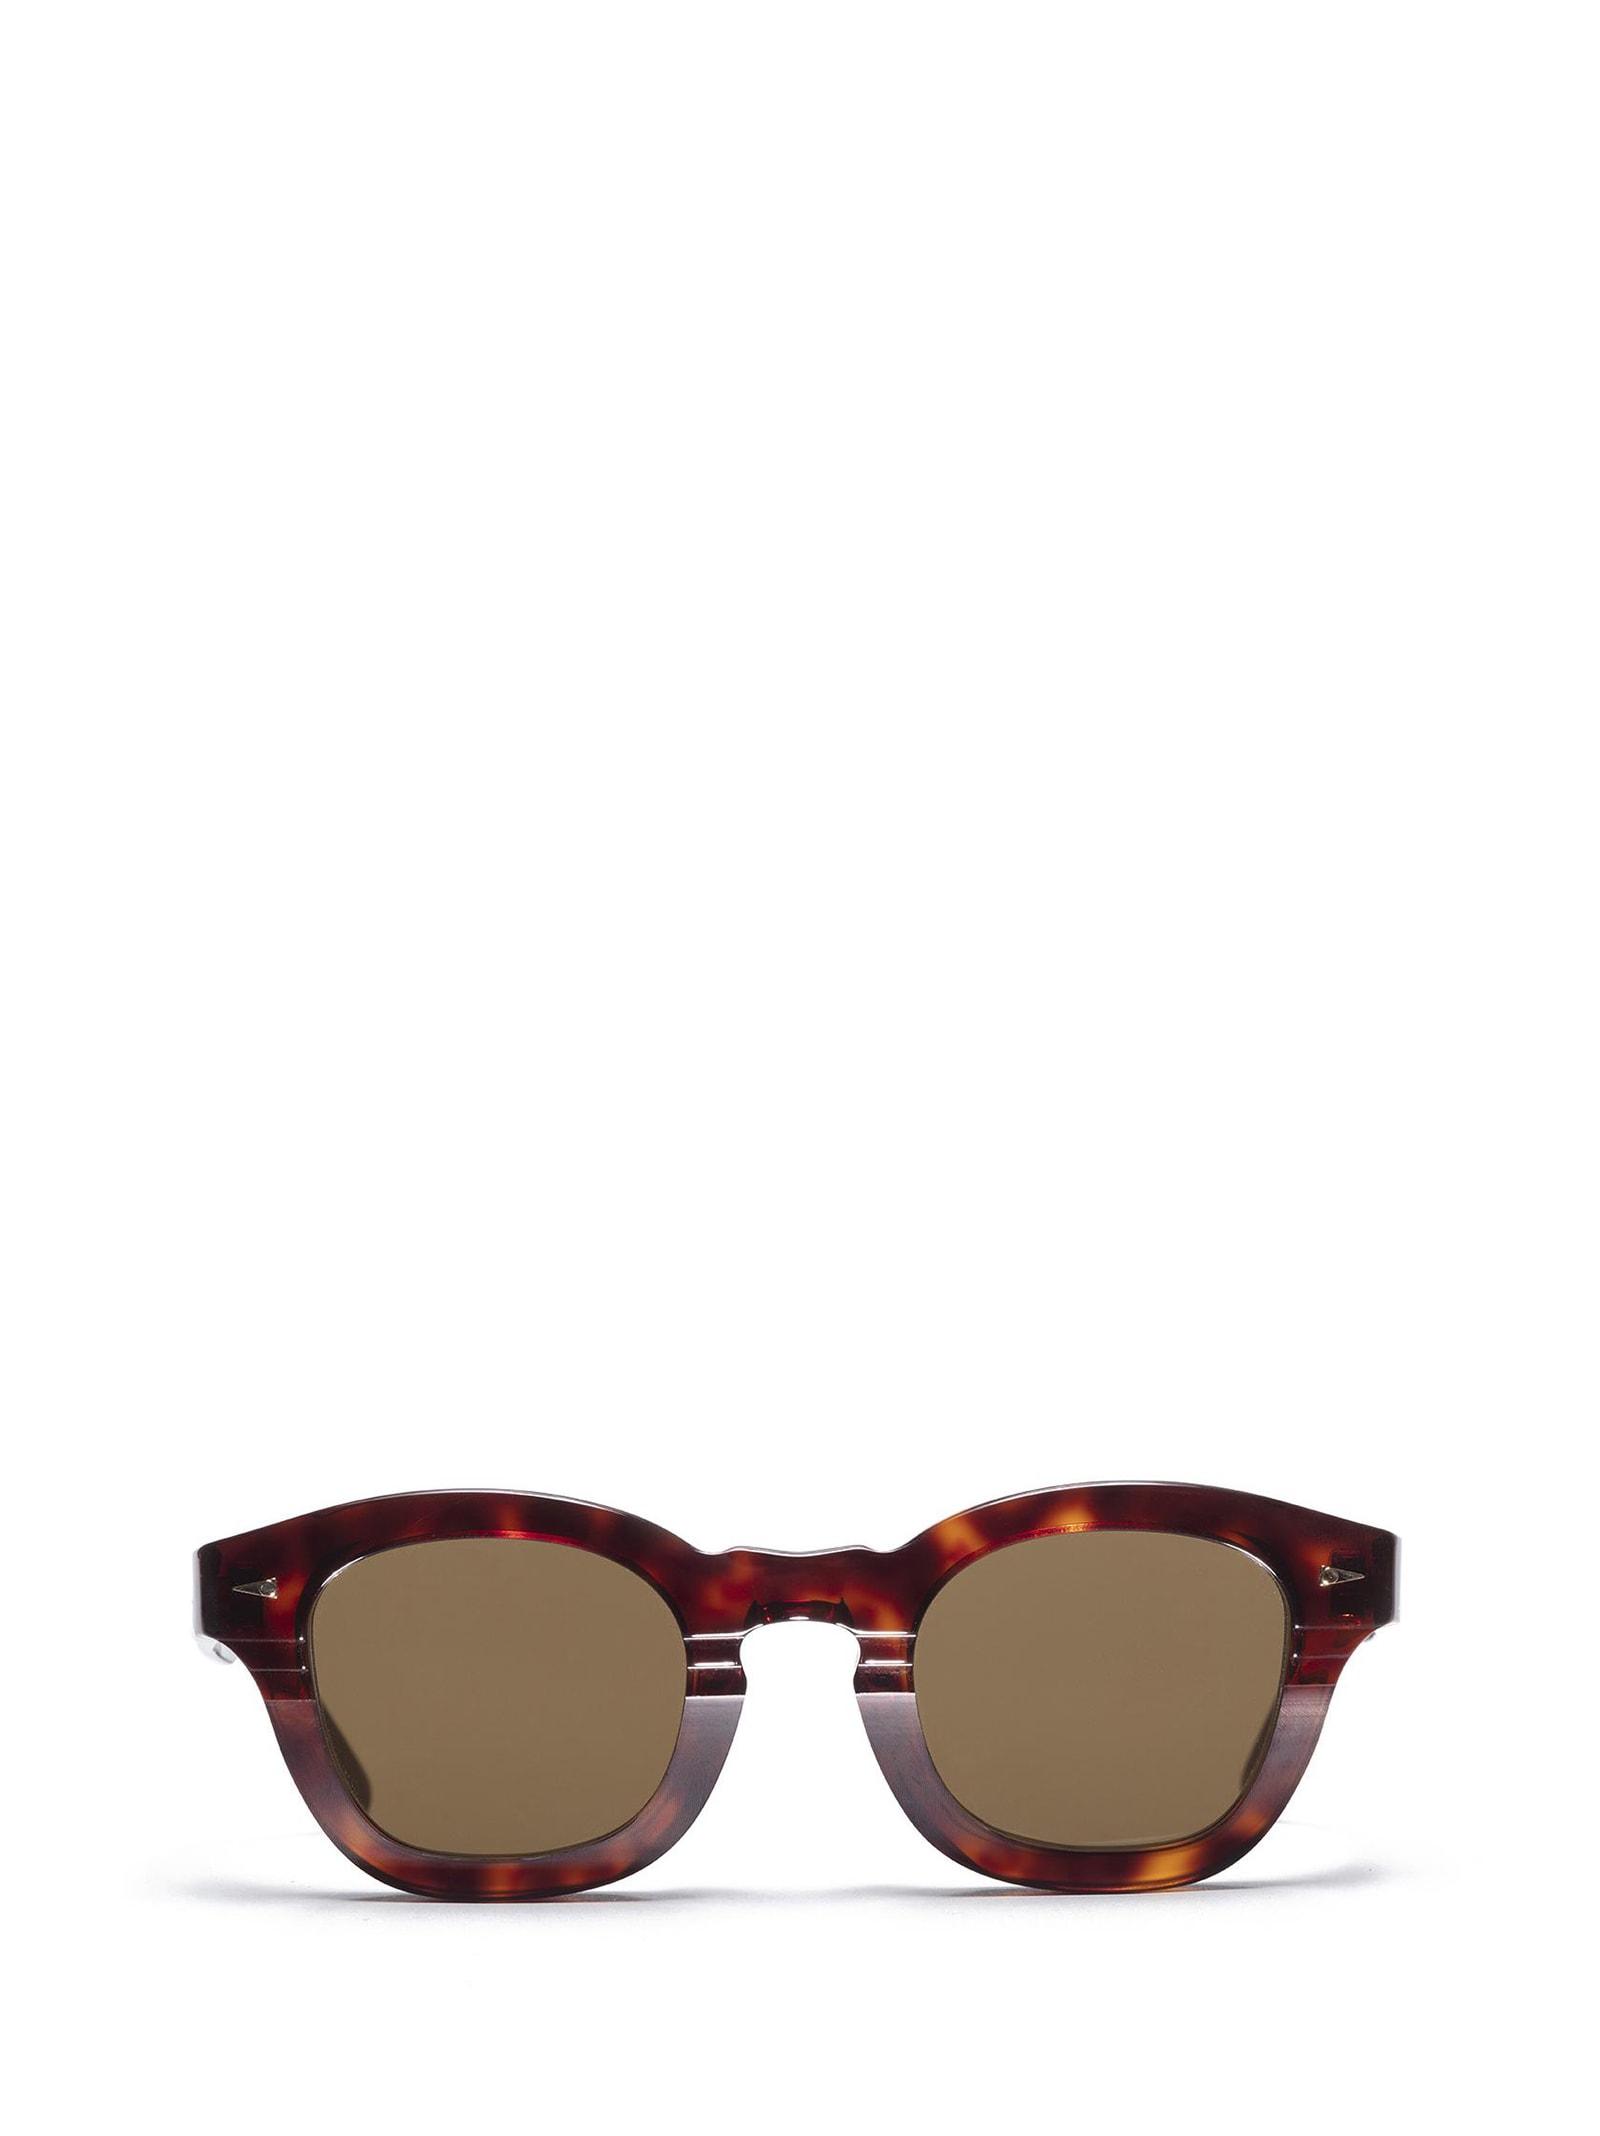 AHLEM Ahlem Le Marais Light Turtle Sunglasses